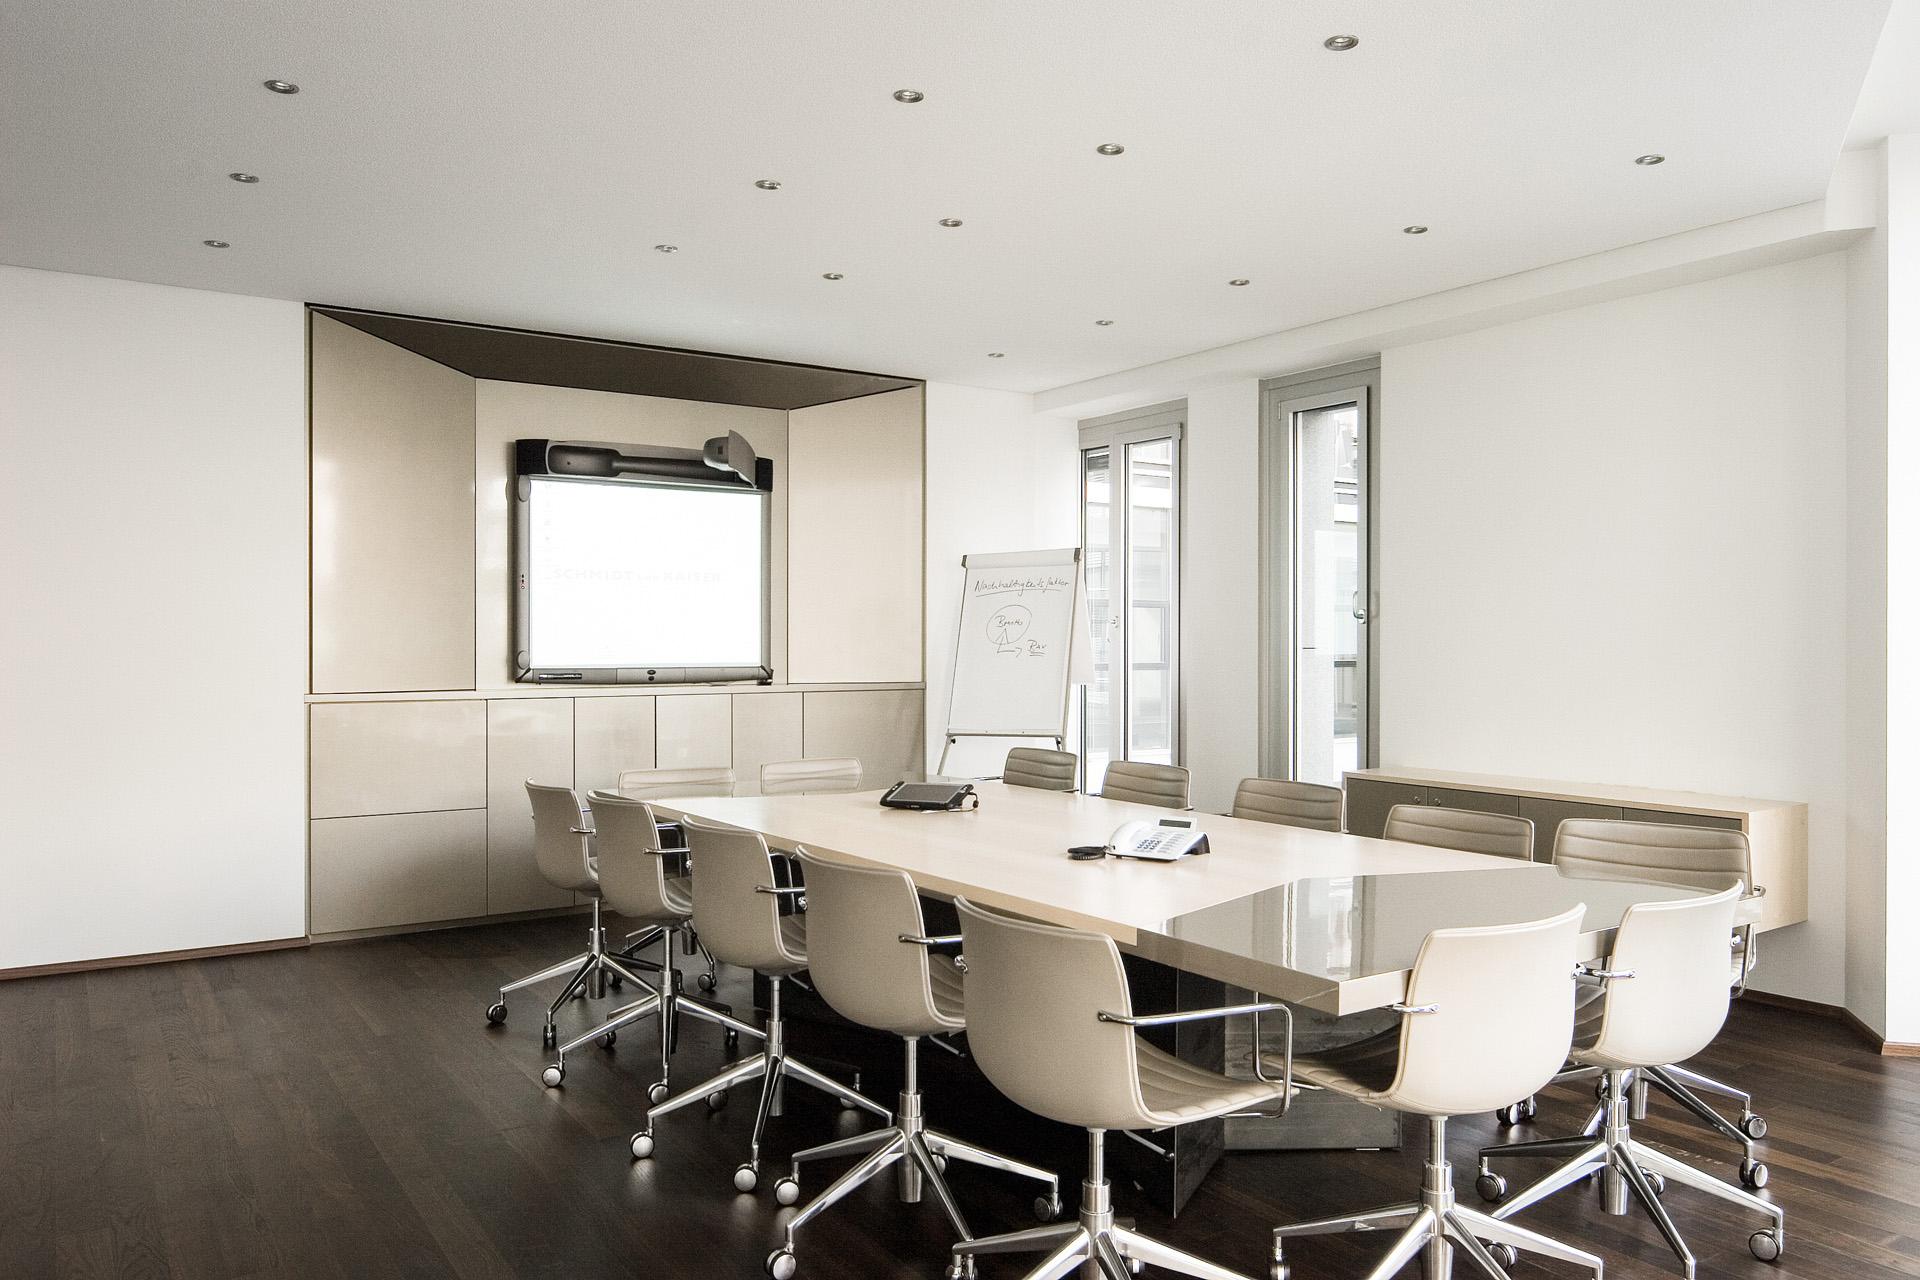 004-interior-design-office-auratis-ag-muenchen-buero-philipp-moeller.jpg